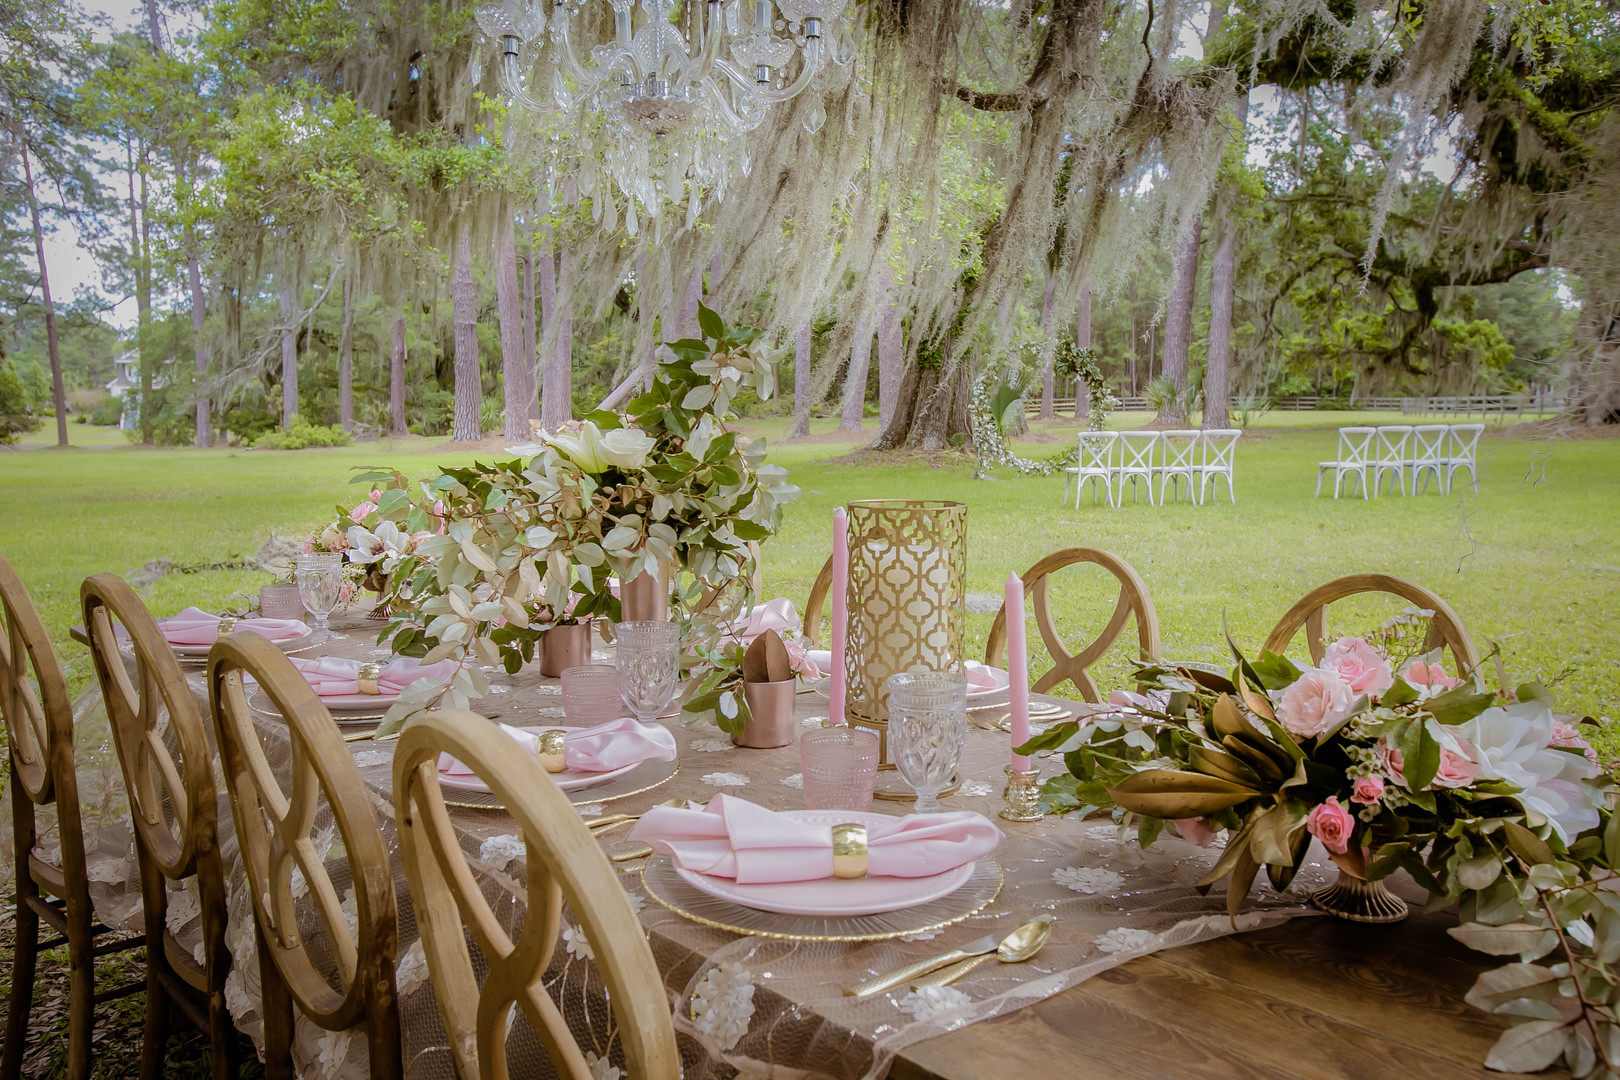 rose-hill-mansion-wedding-19.jpg